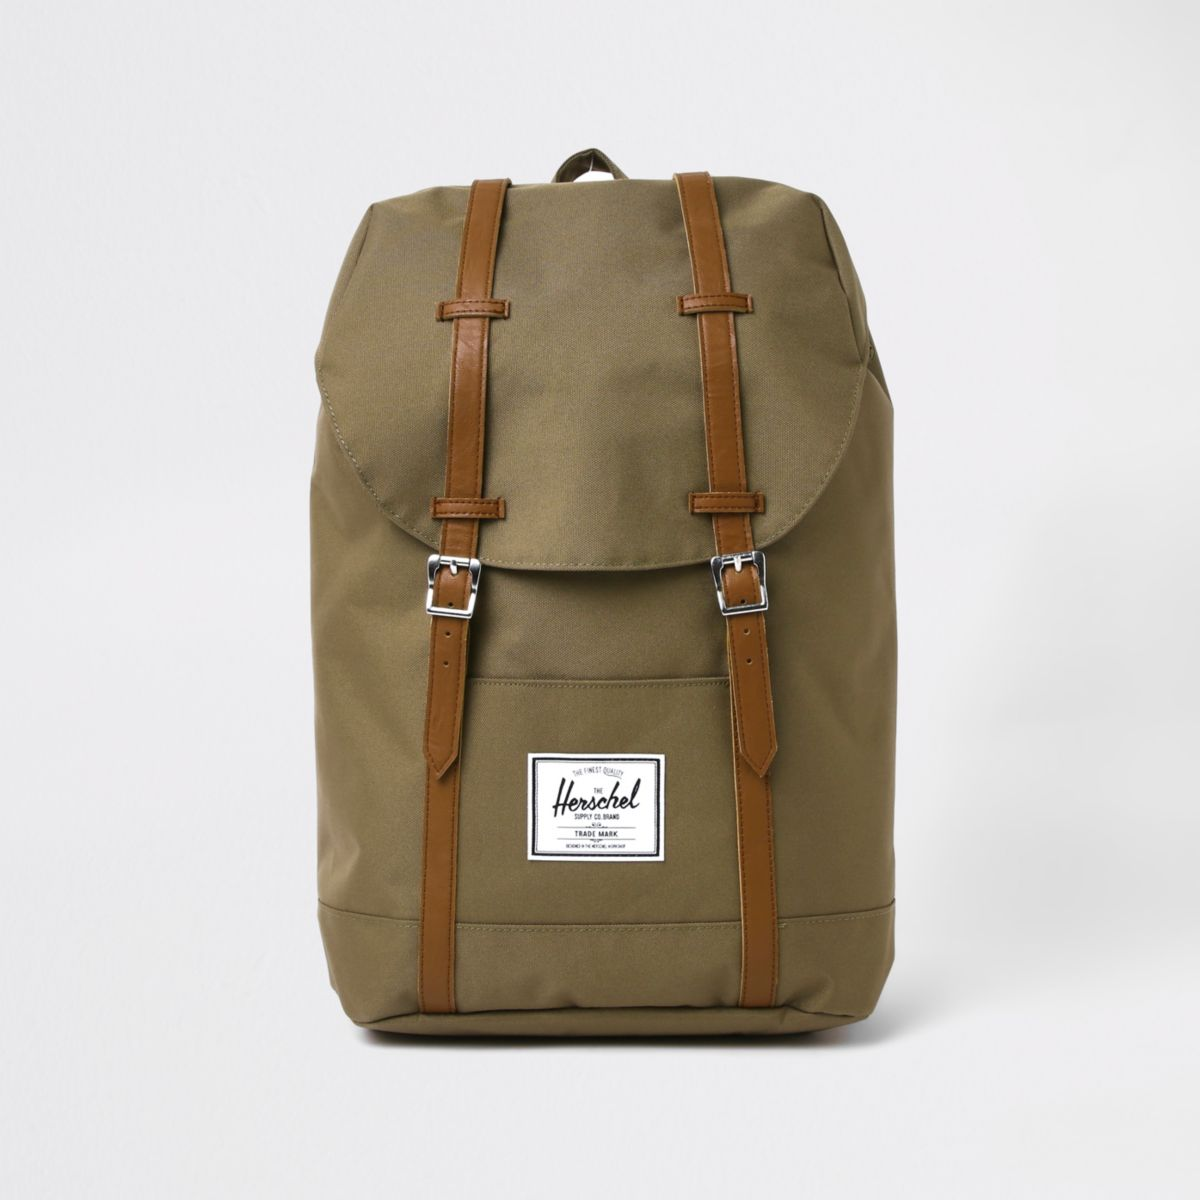 Herschel stone Retreat stone backpack